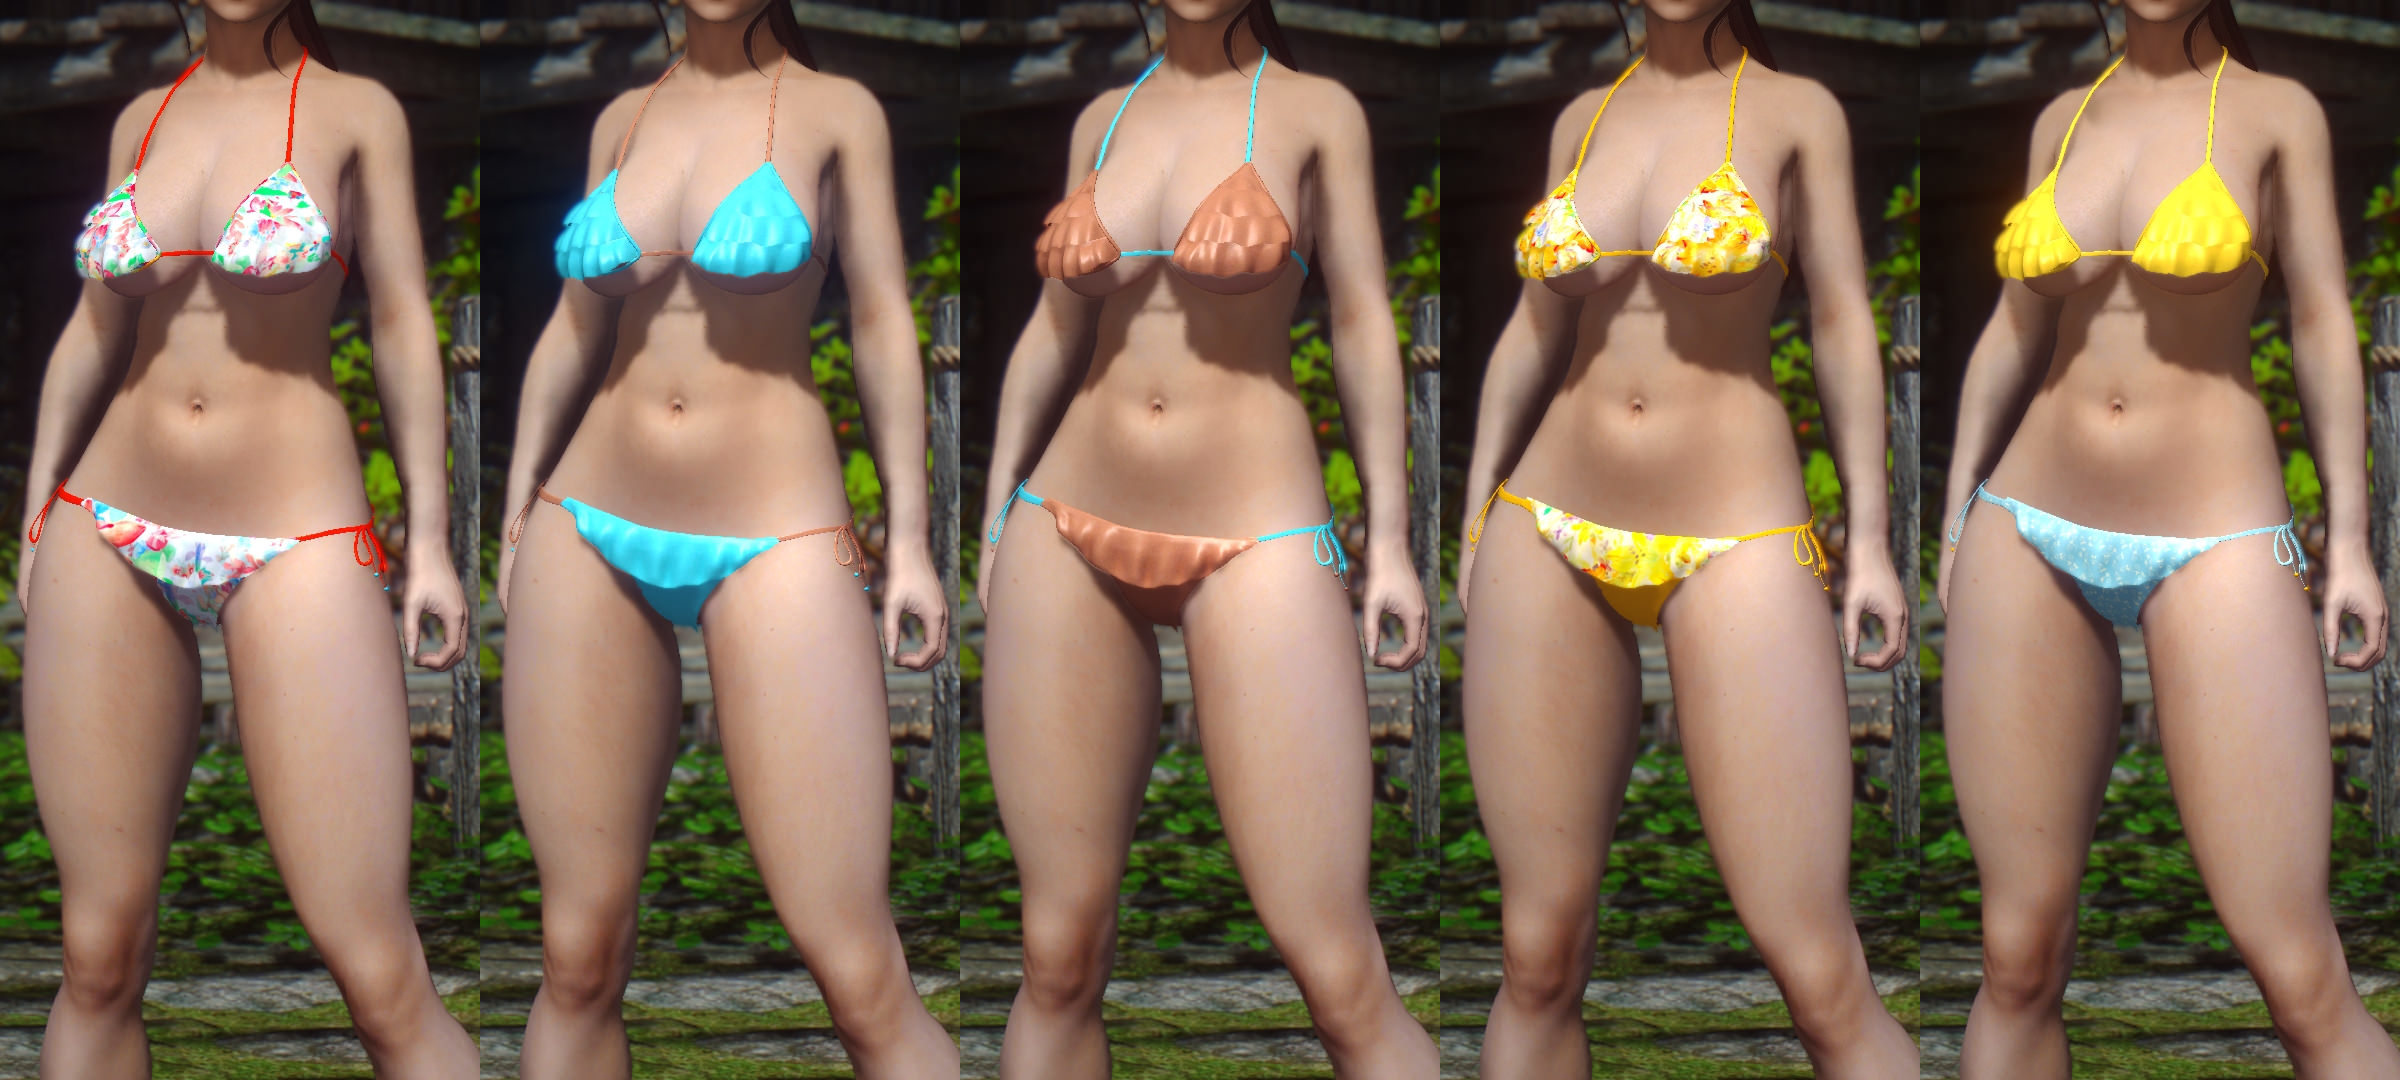 Daz_Bikini_Collection_2_7BO_7.jpg